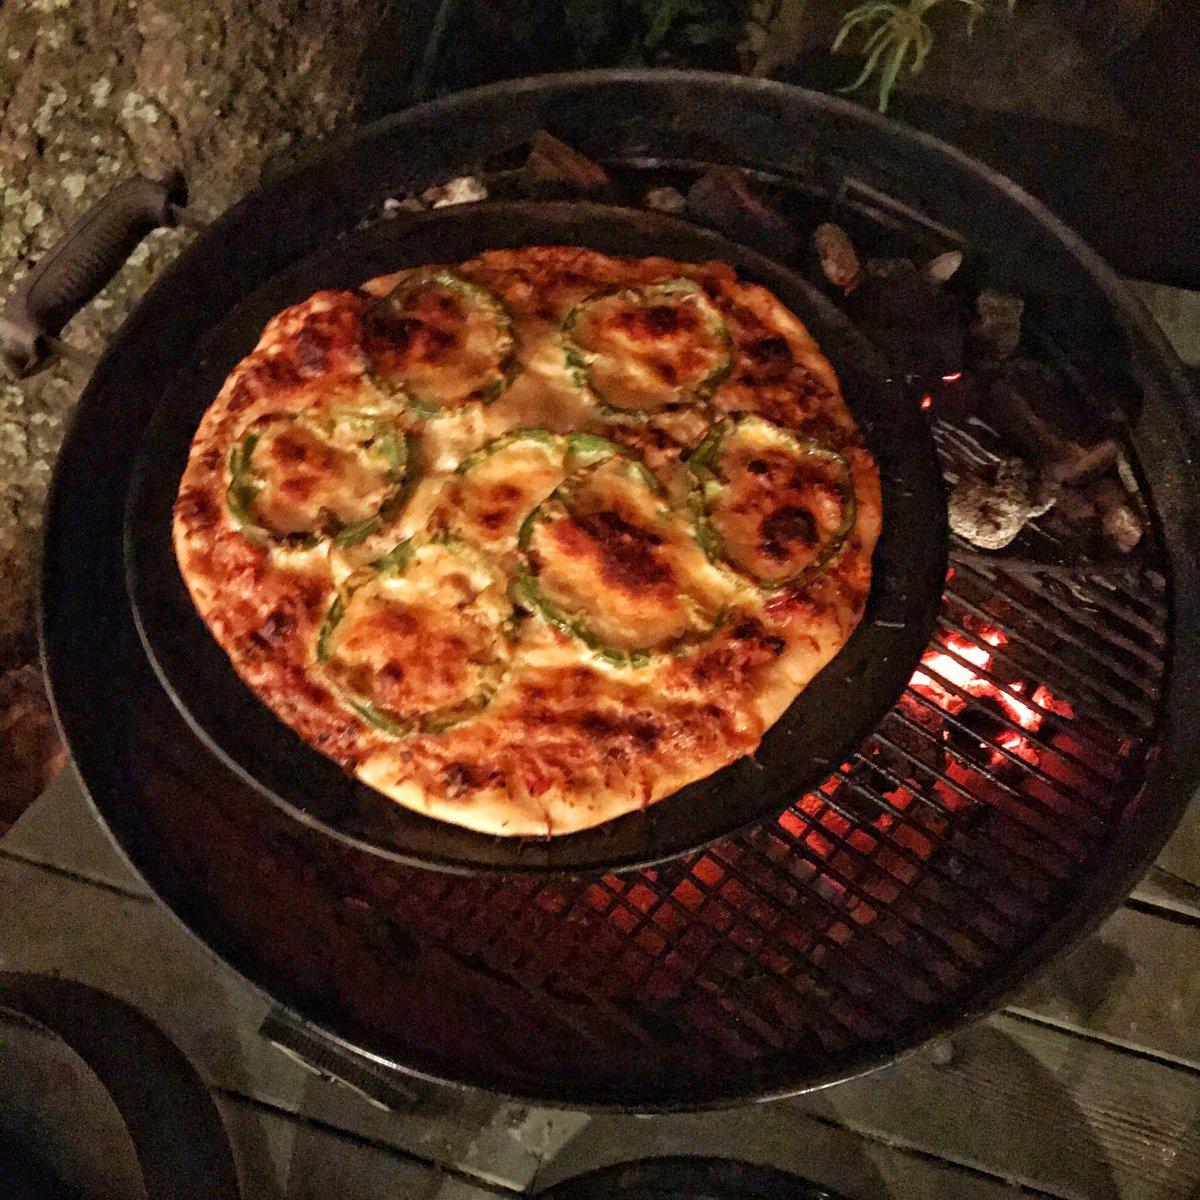 @BigIslandBound @meathead @meathead 's pizza method ain't bad either